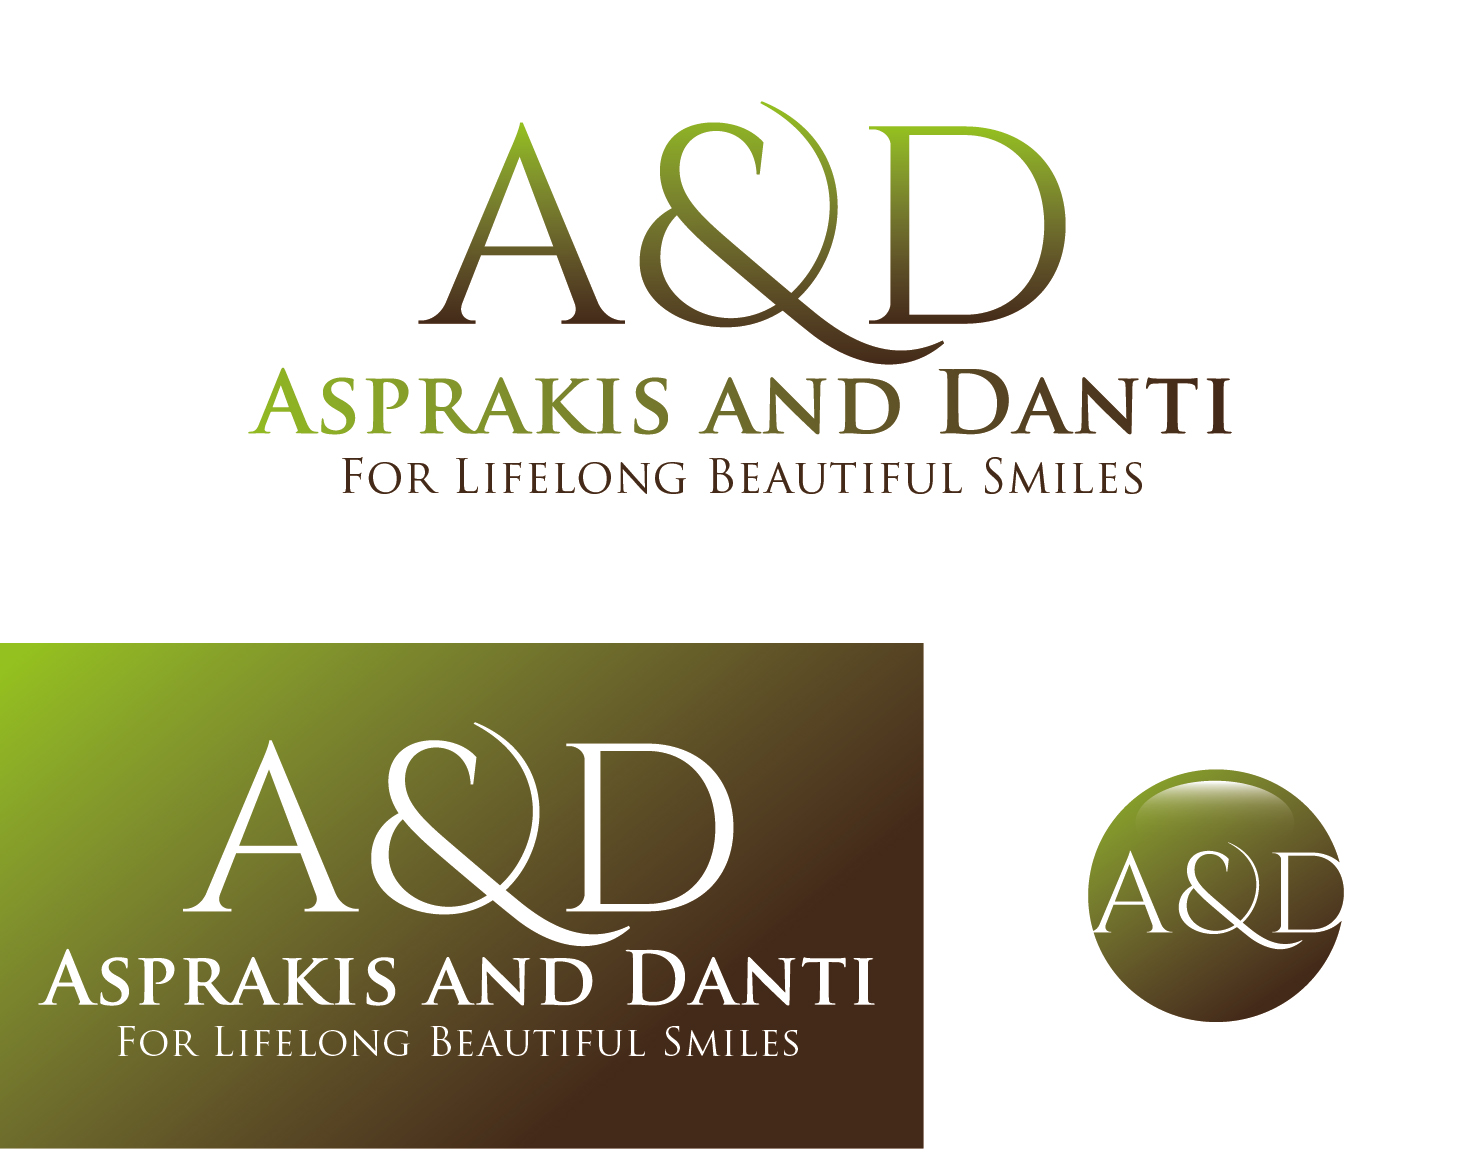 Logo Design by VENTSISLAV KOVACHEV - Entry No. 92 in the Logo Design Contest Unique Logo Design Wanted for Asprakis and Danti.